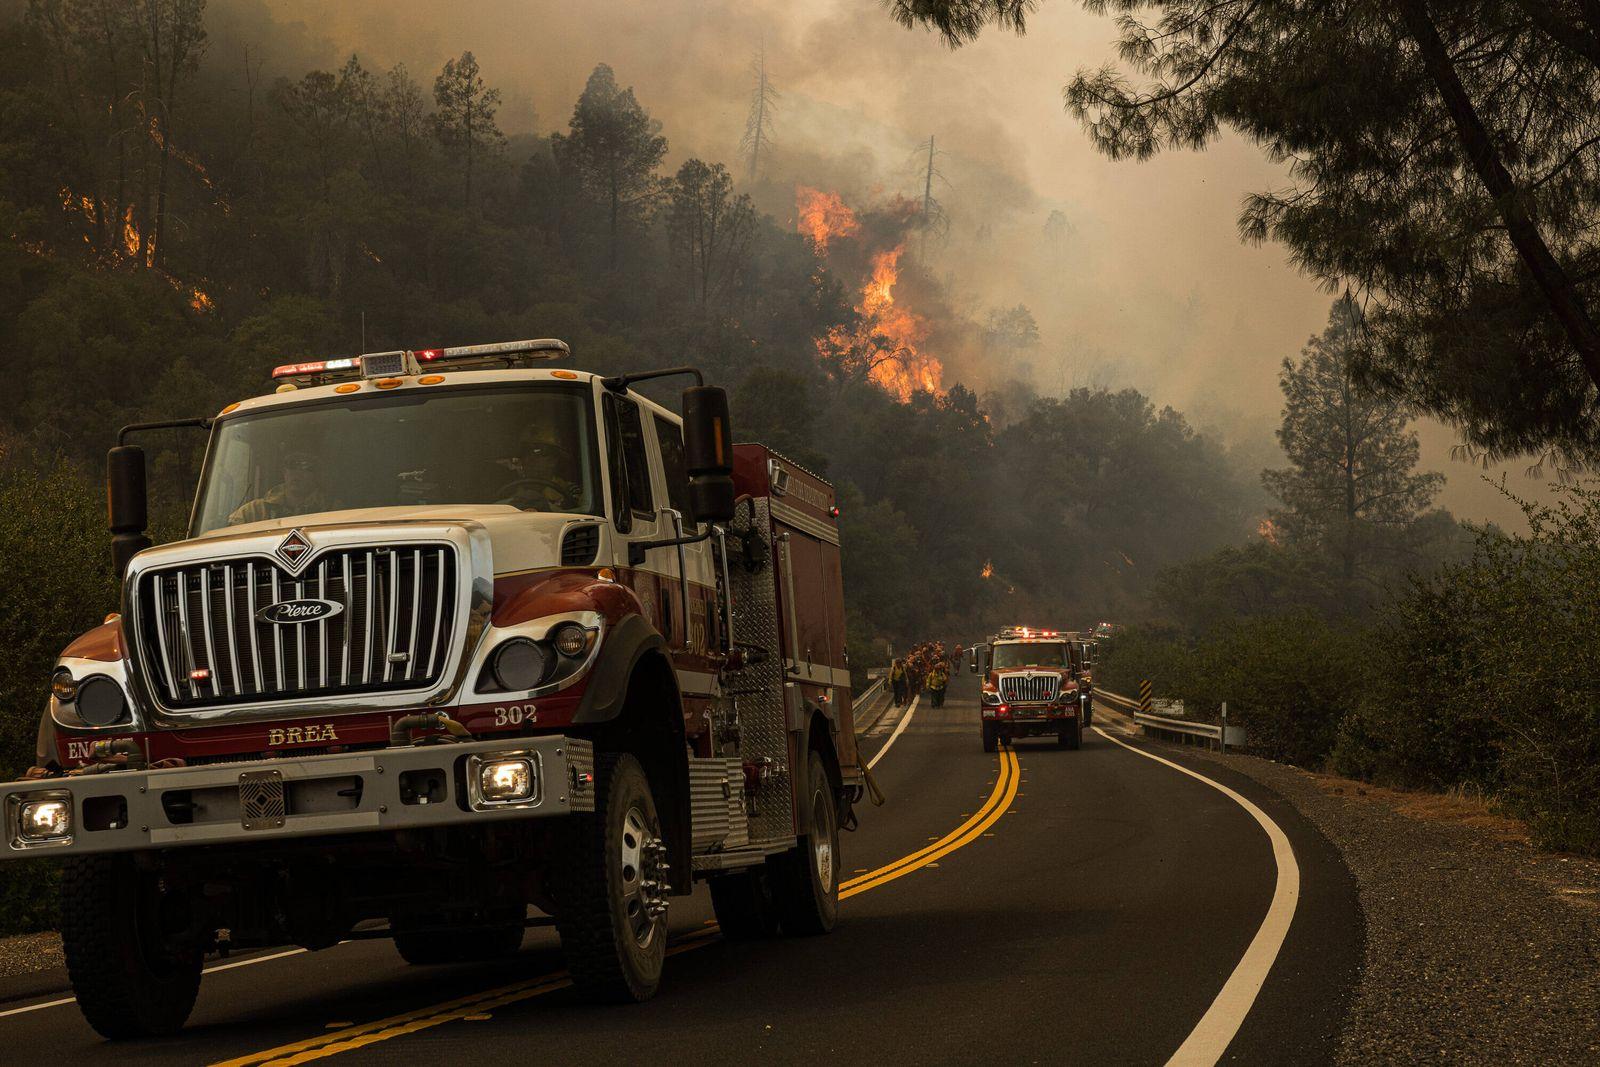 August 20, 2020, Mocassin, California, U.S: Fire crews move along Hwy 49 as the MocFire burns near San Franciscos Hetch